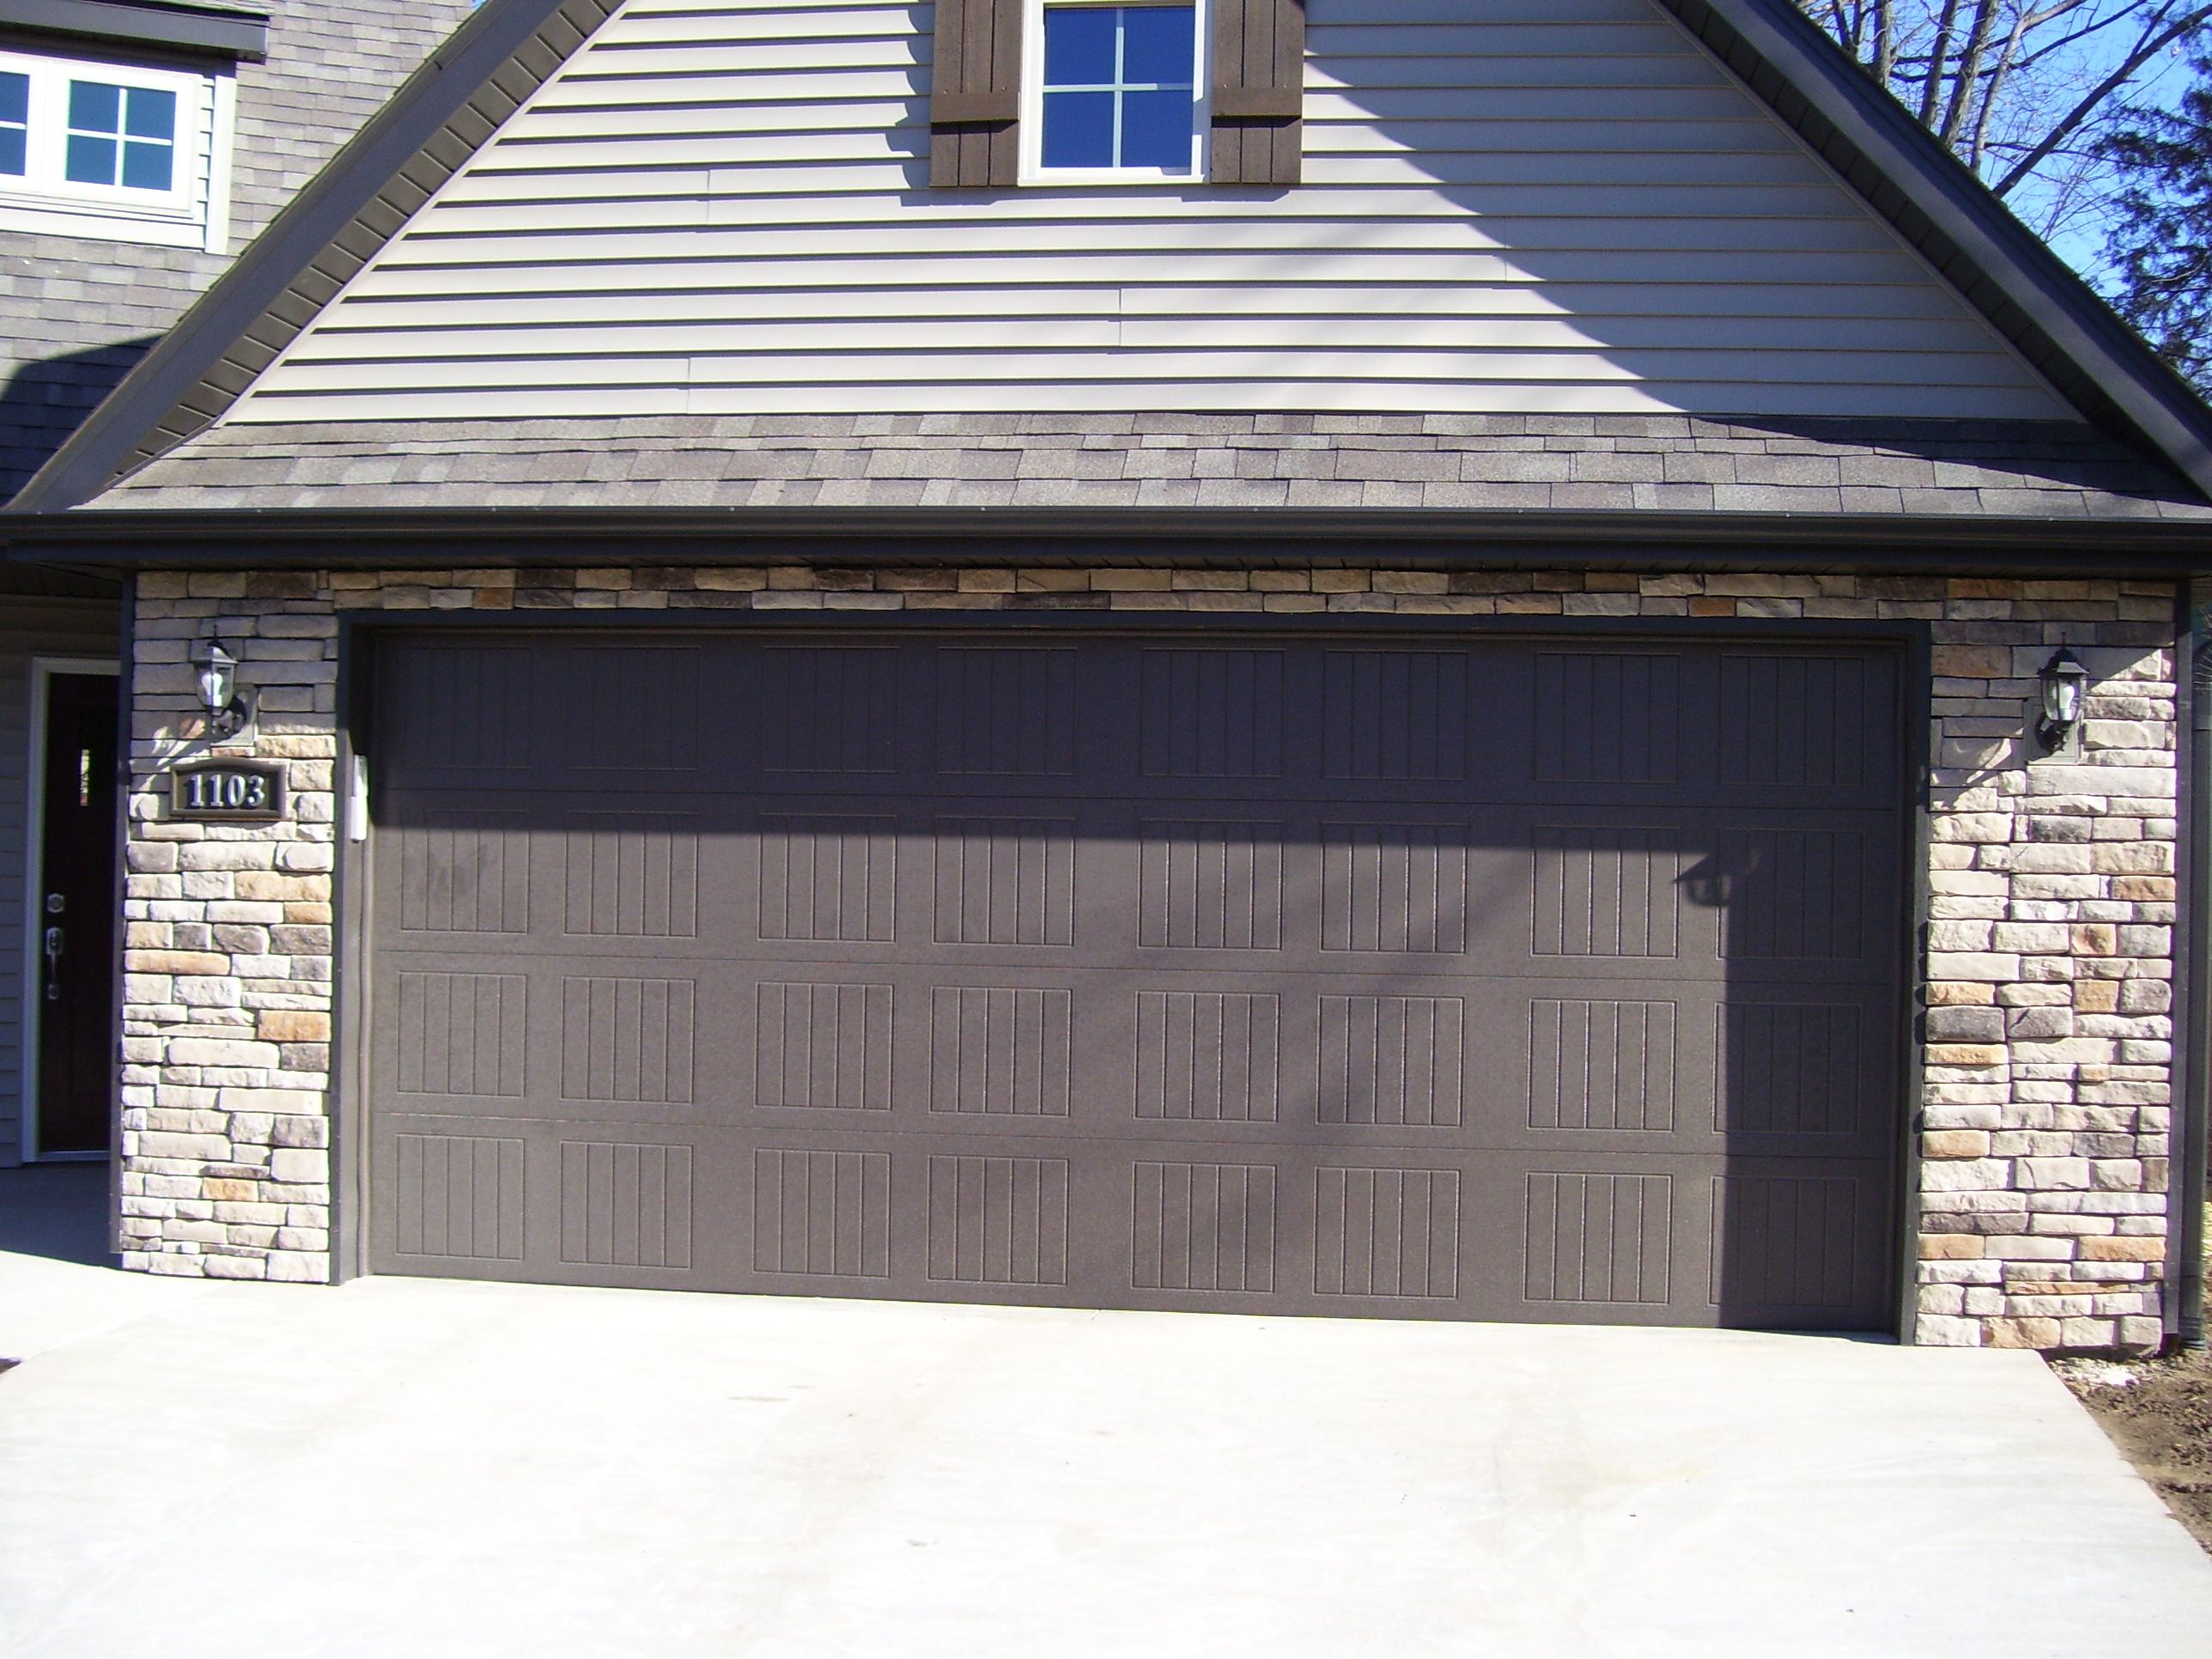 Sonoma Style Garage Doors Custom Homes By Tompkins Homes And Development Garage Doors Garage Doors Prices Garage Door Design